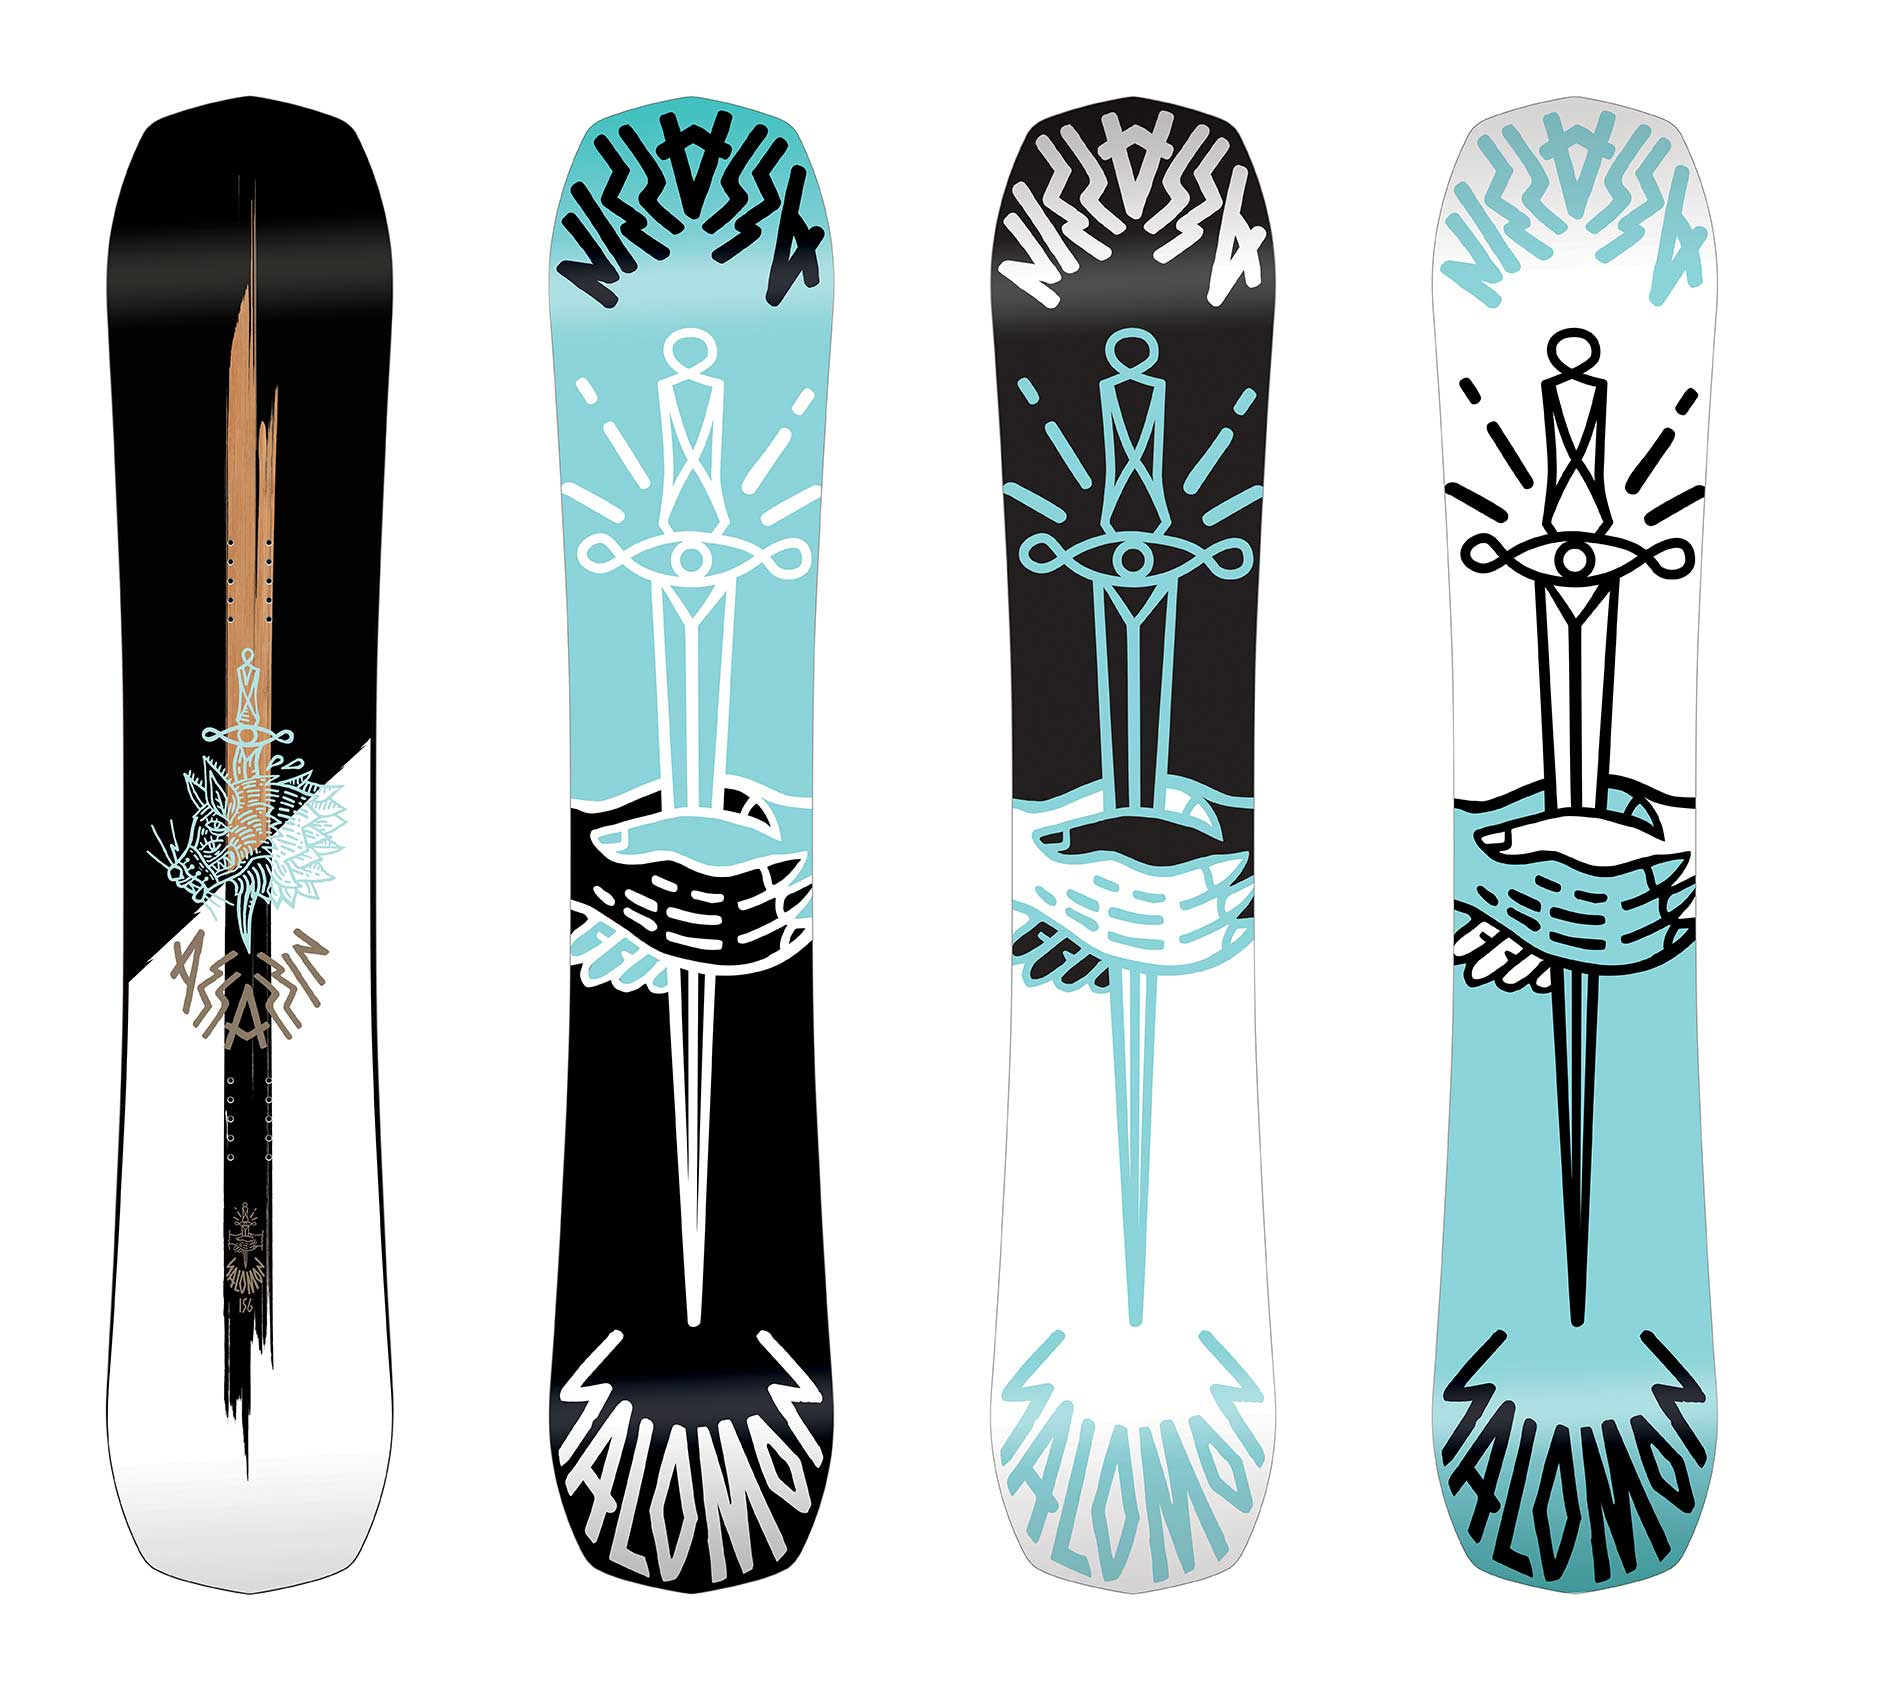 Salomon Assassin Snowboard 159cm review